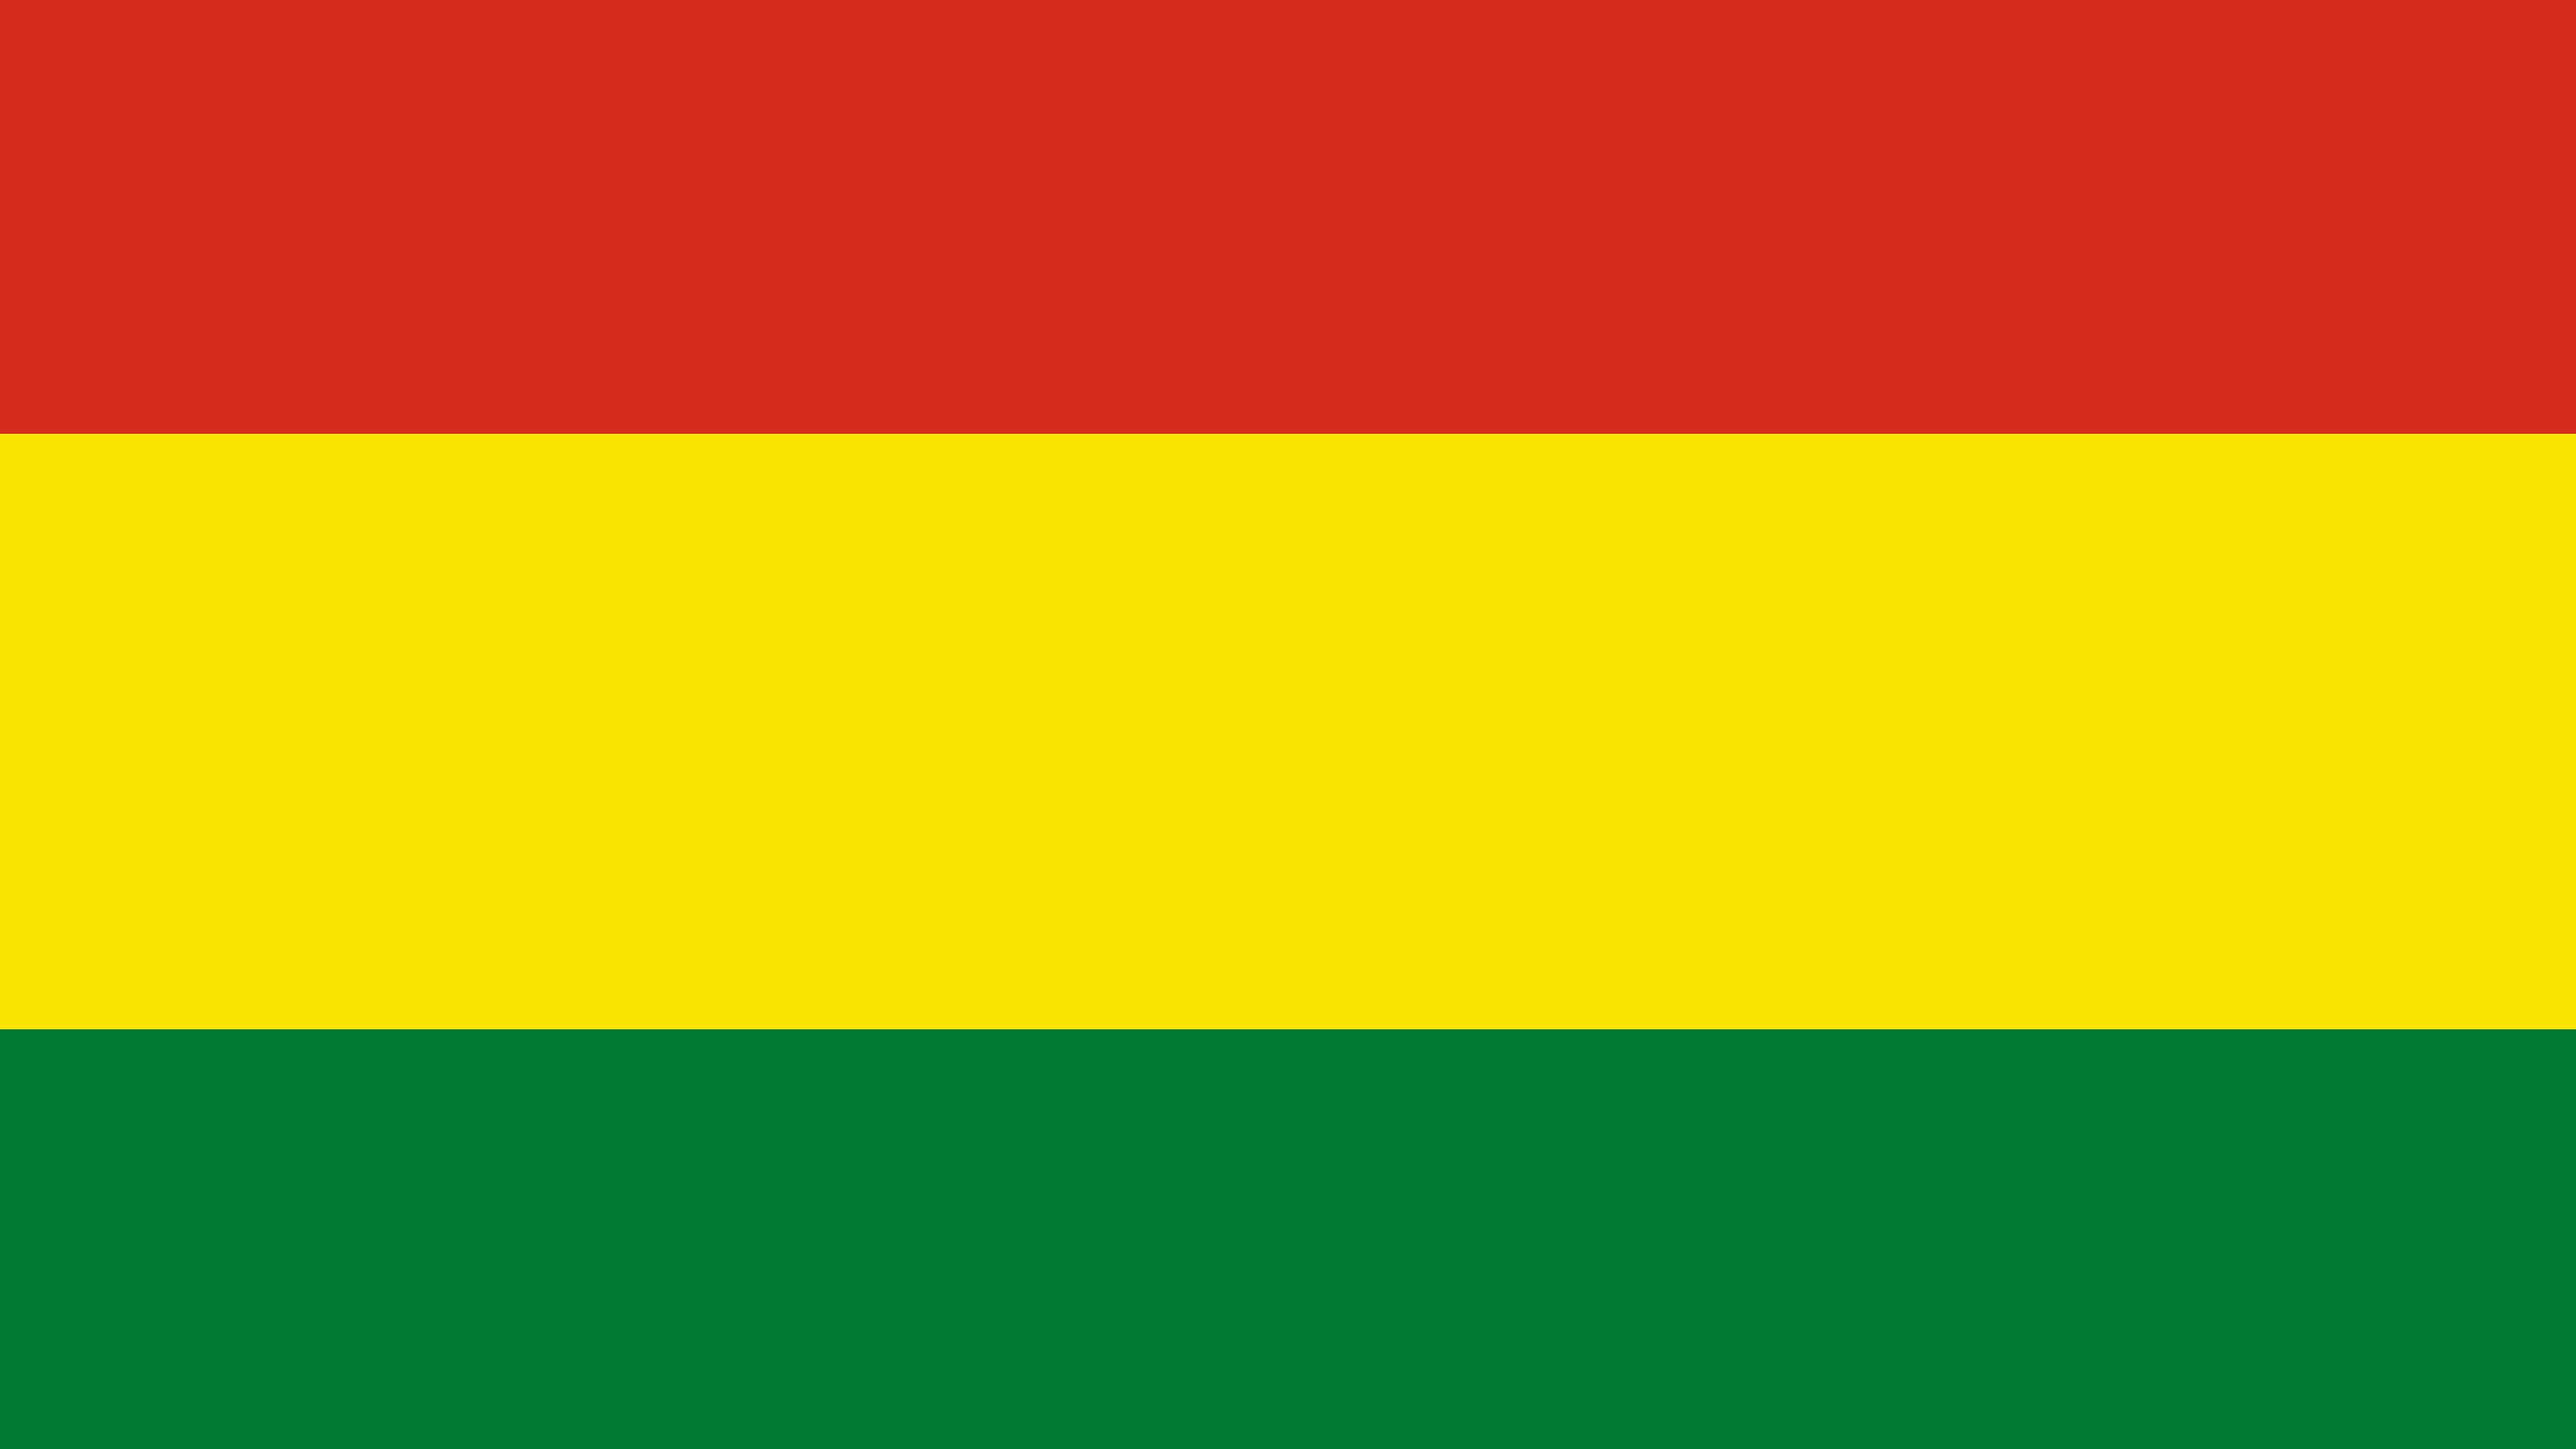 bolivia flag uhd 4k wallpaper